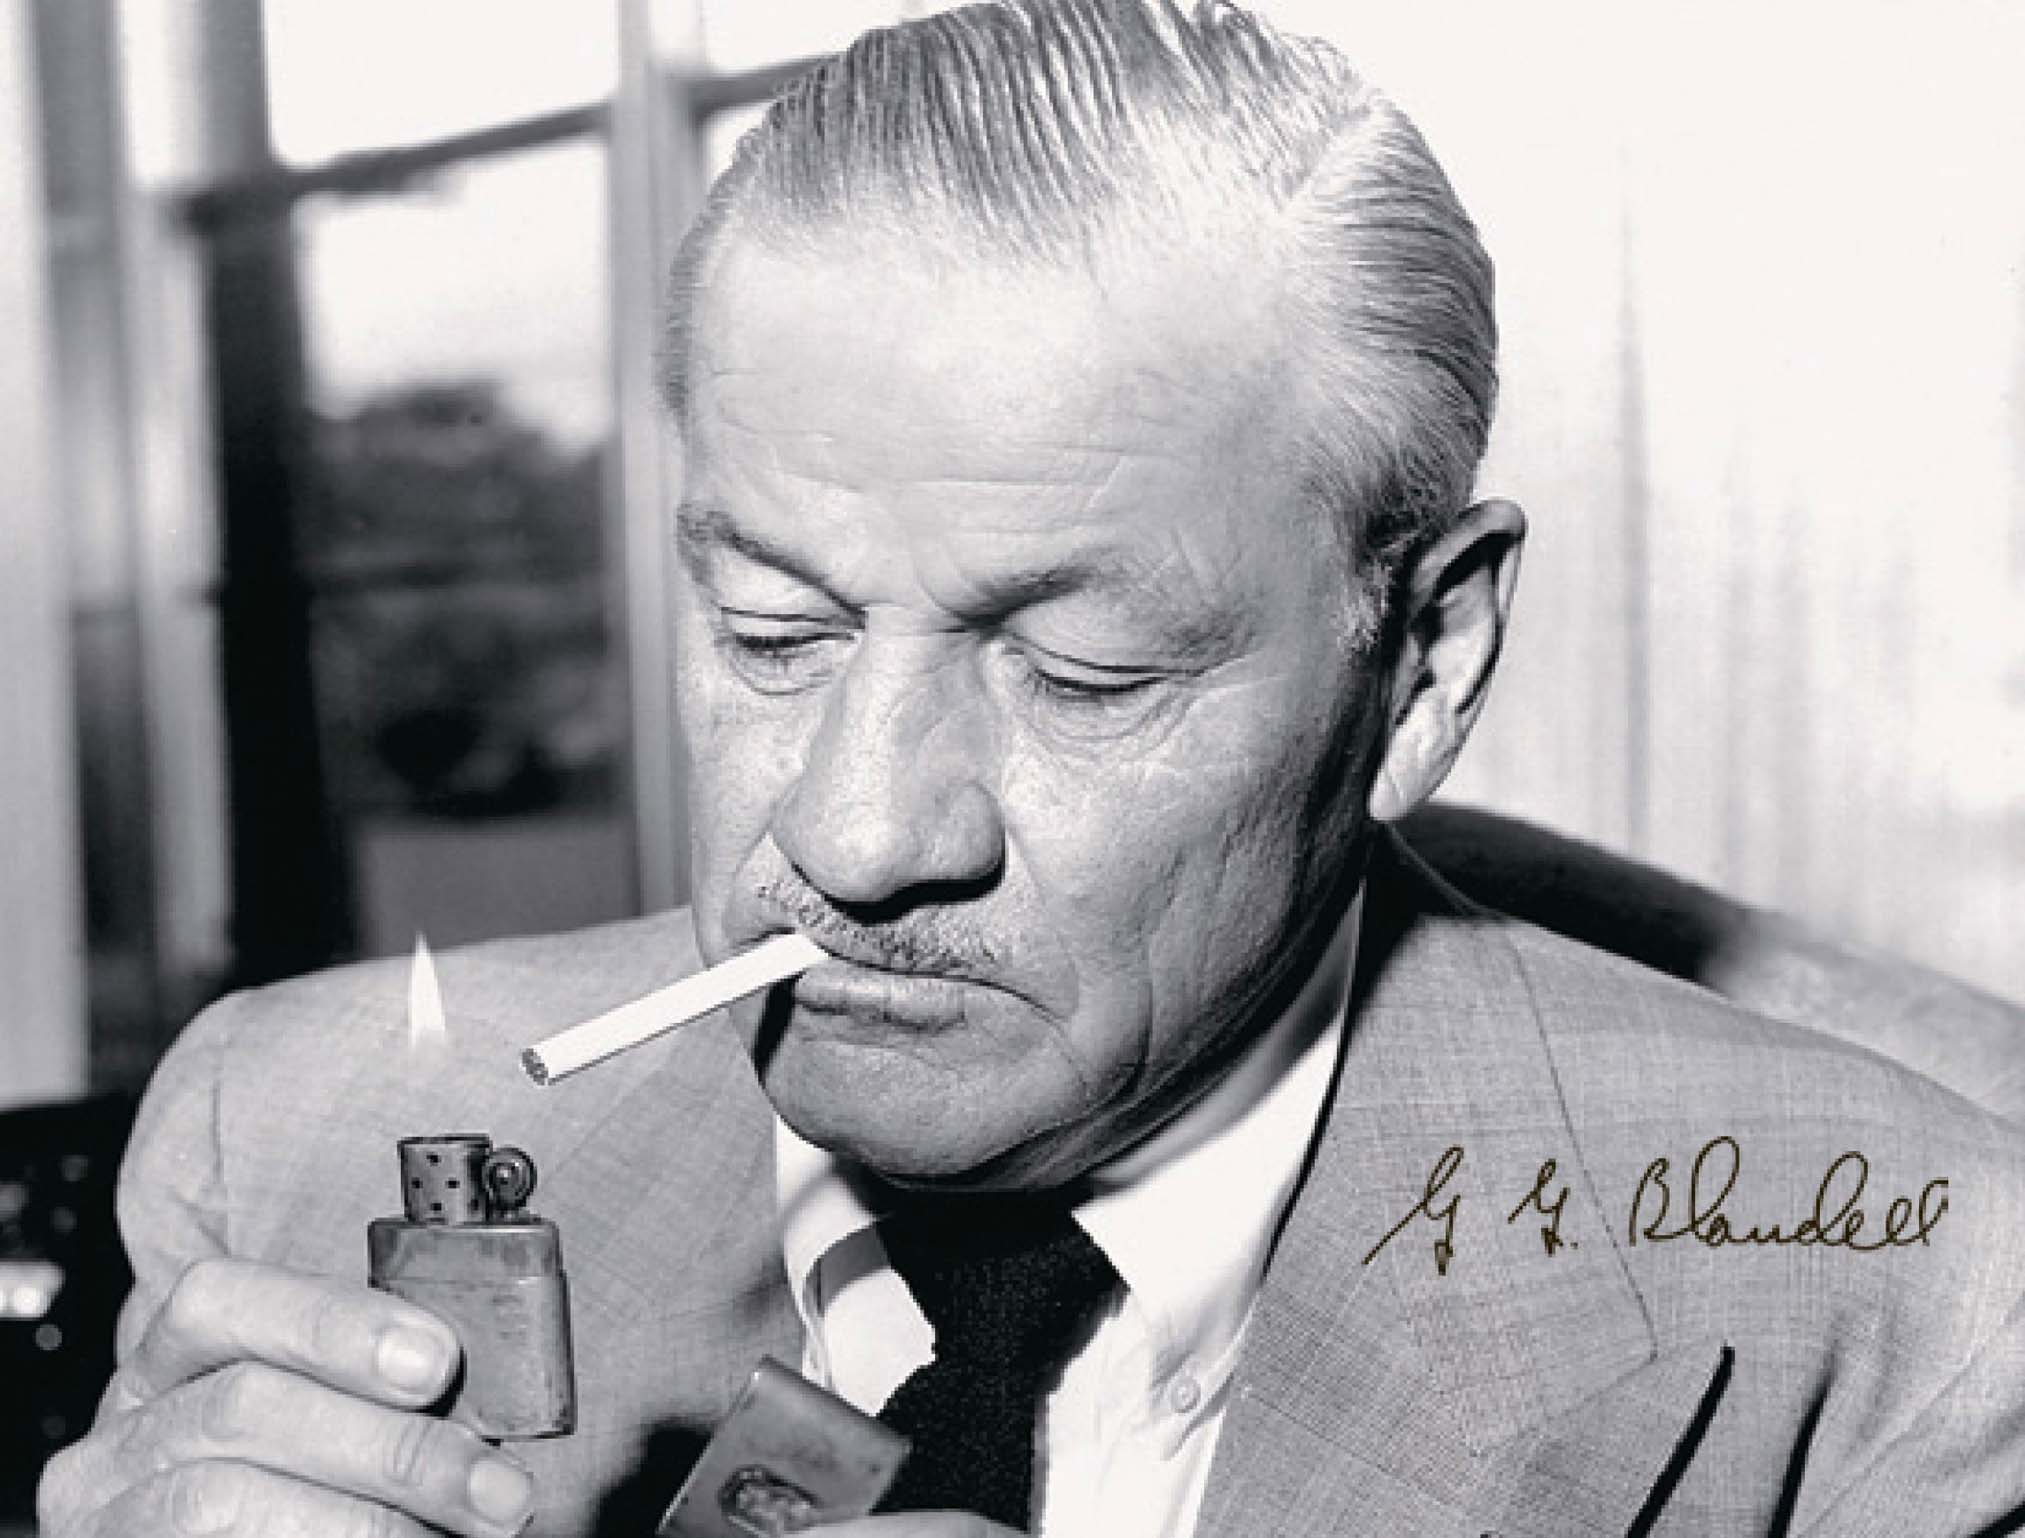 George Grant Blaisdell inventor de Zippo